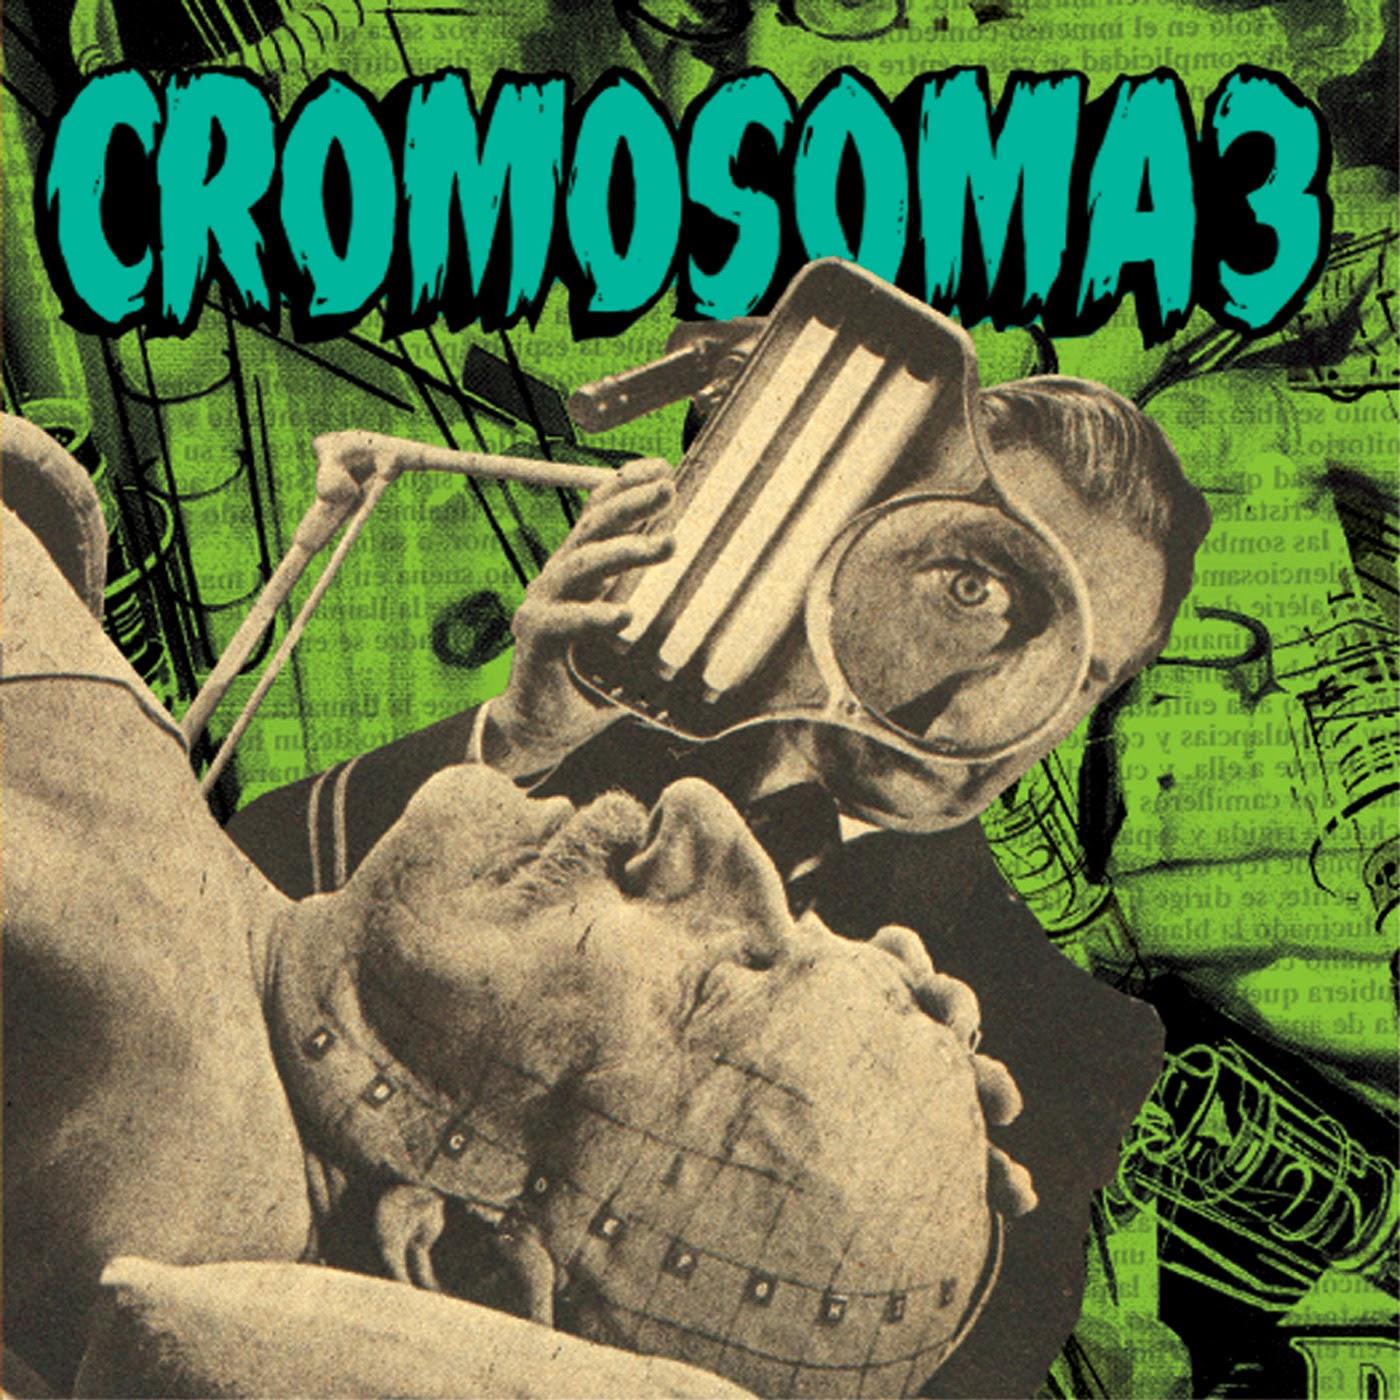 "CROMOSOMA3 - Mentes Enfermas 7"""